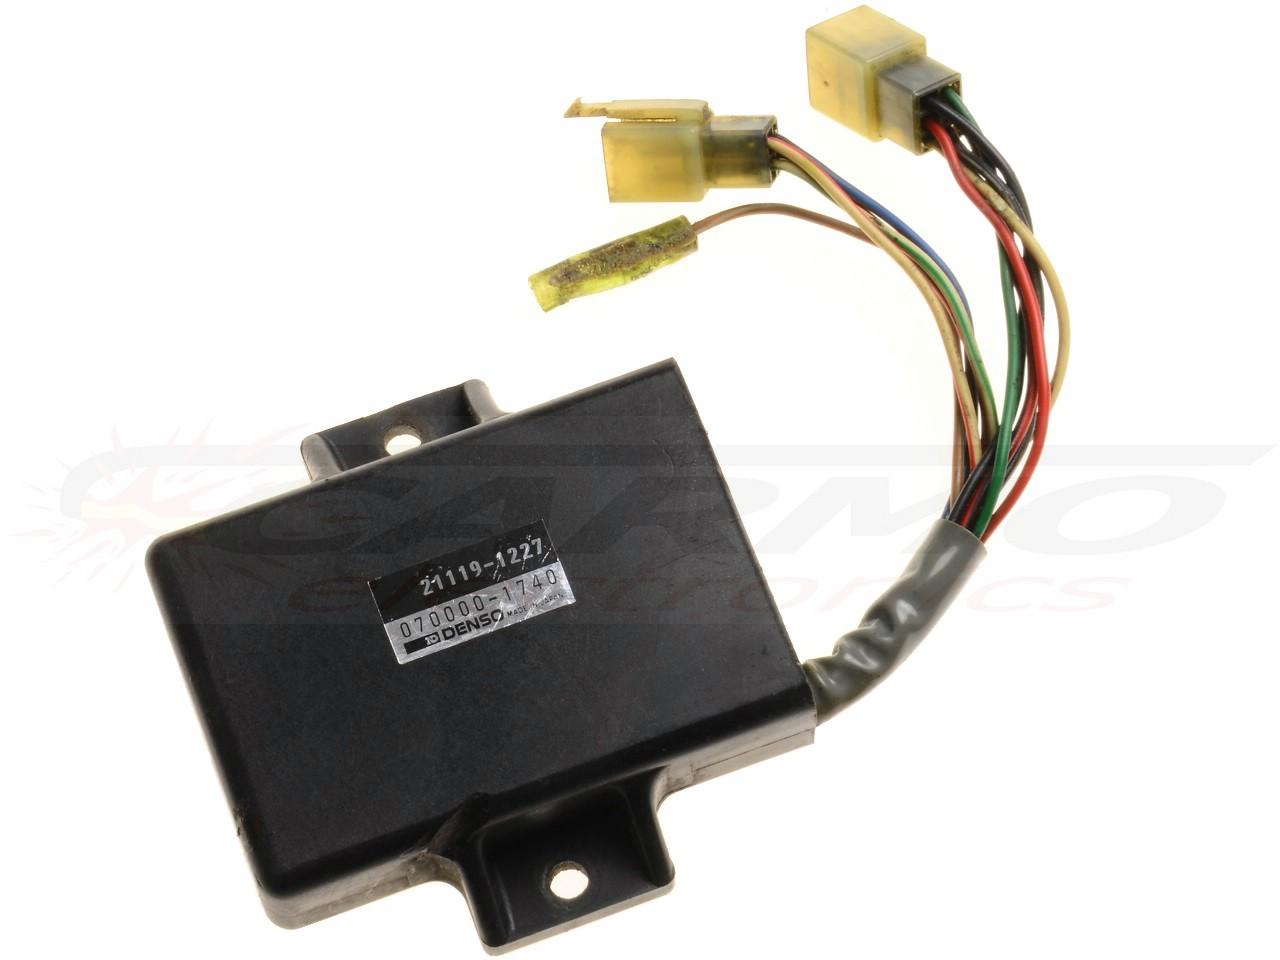 Kawasaki Carmo Electronics The Place For Parts Or Gpz1000rx Wiring Diagram Kz305 Z305 Ltd Csr 21119 1227 07000 1740 Cdi Igniter